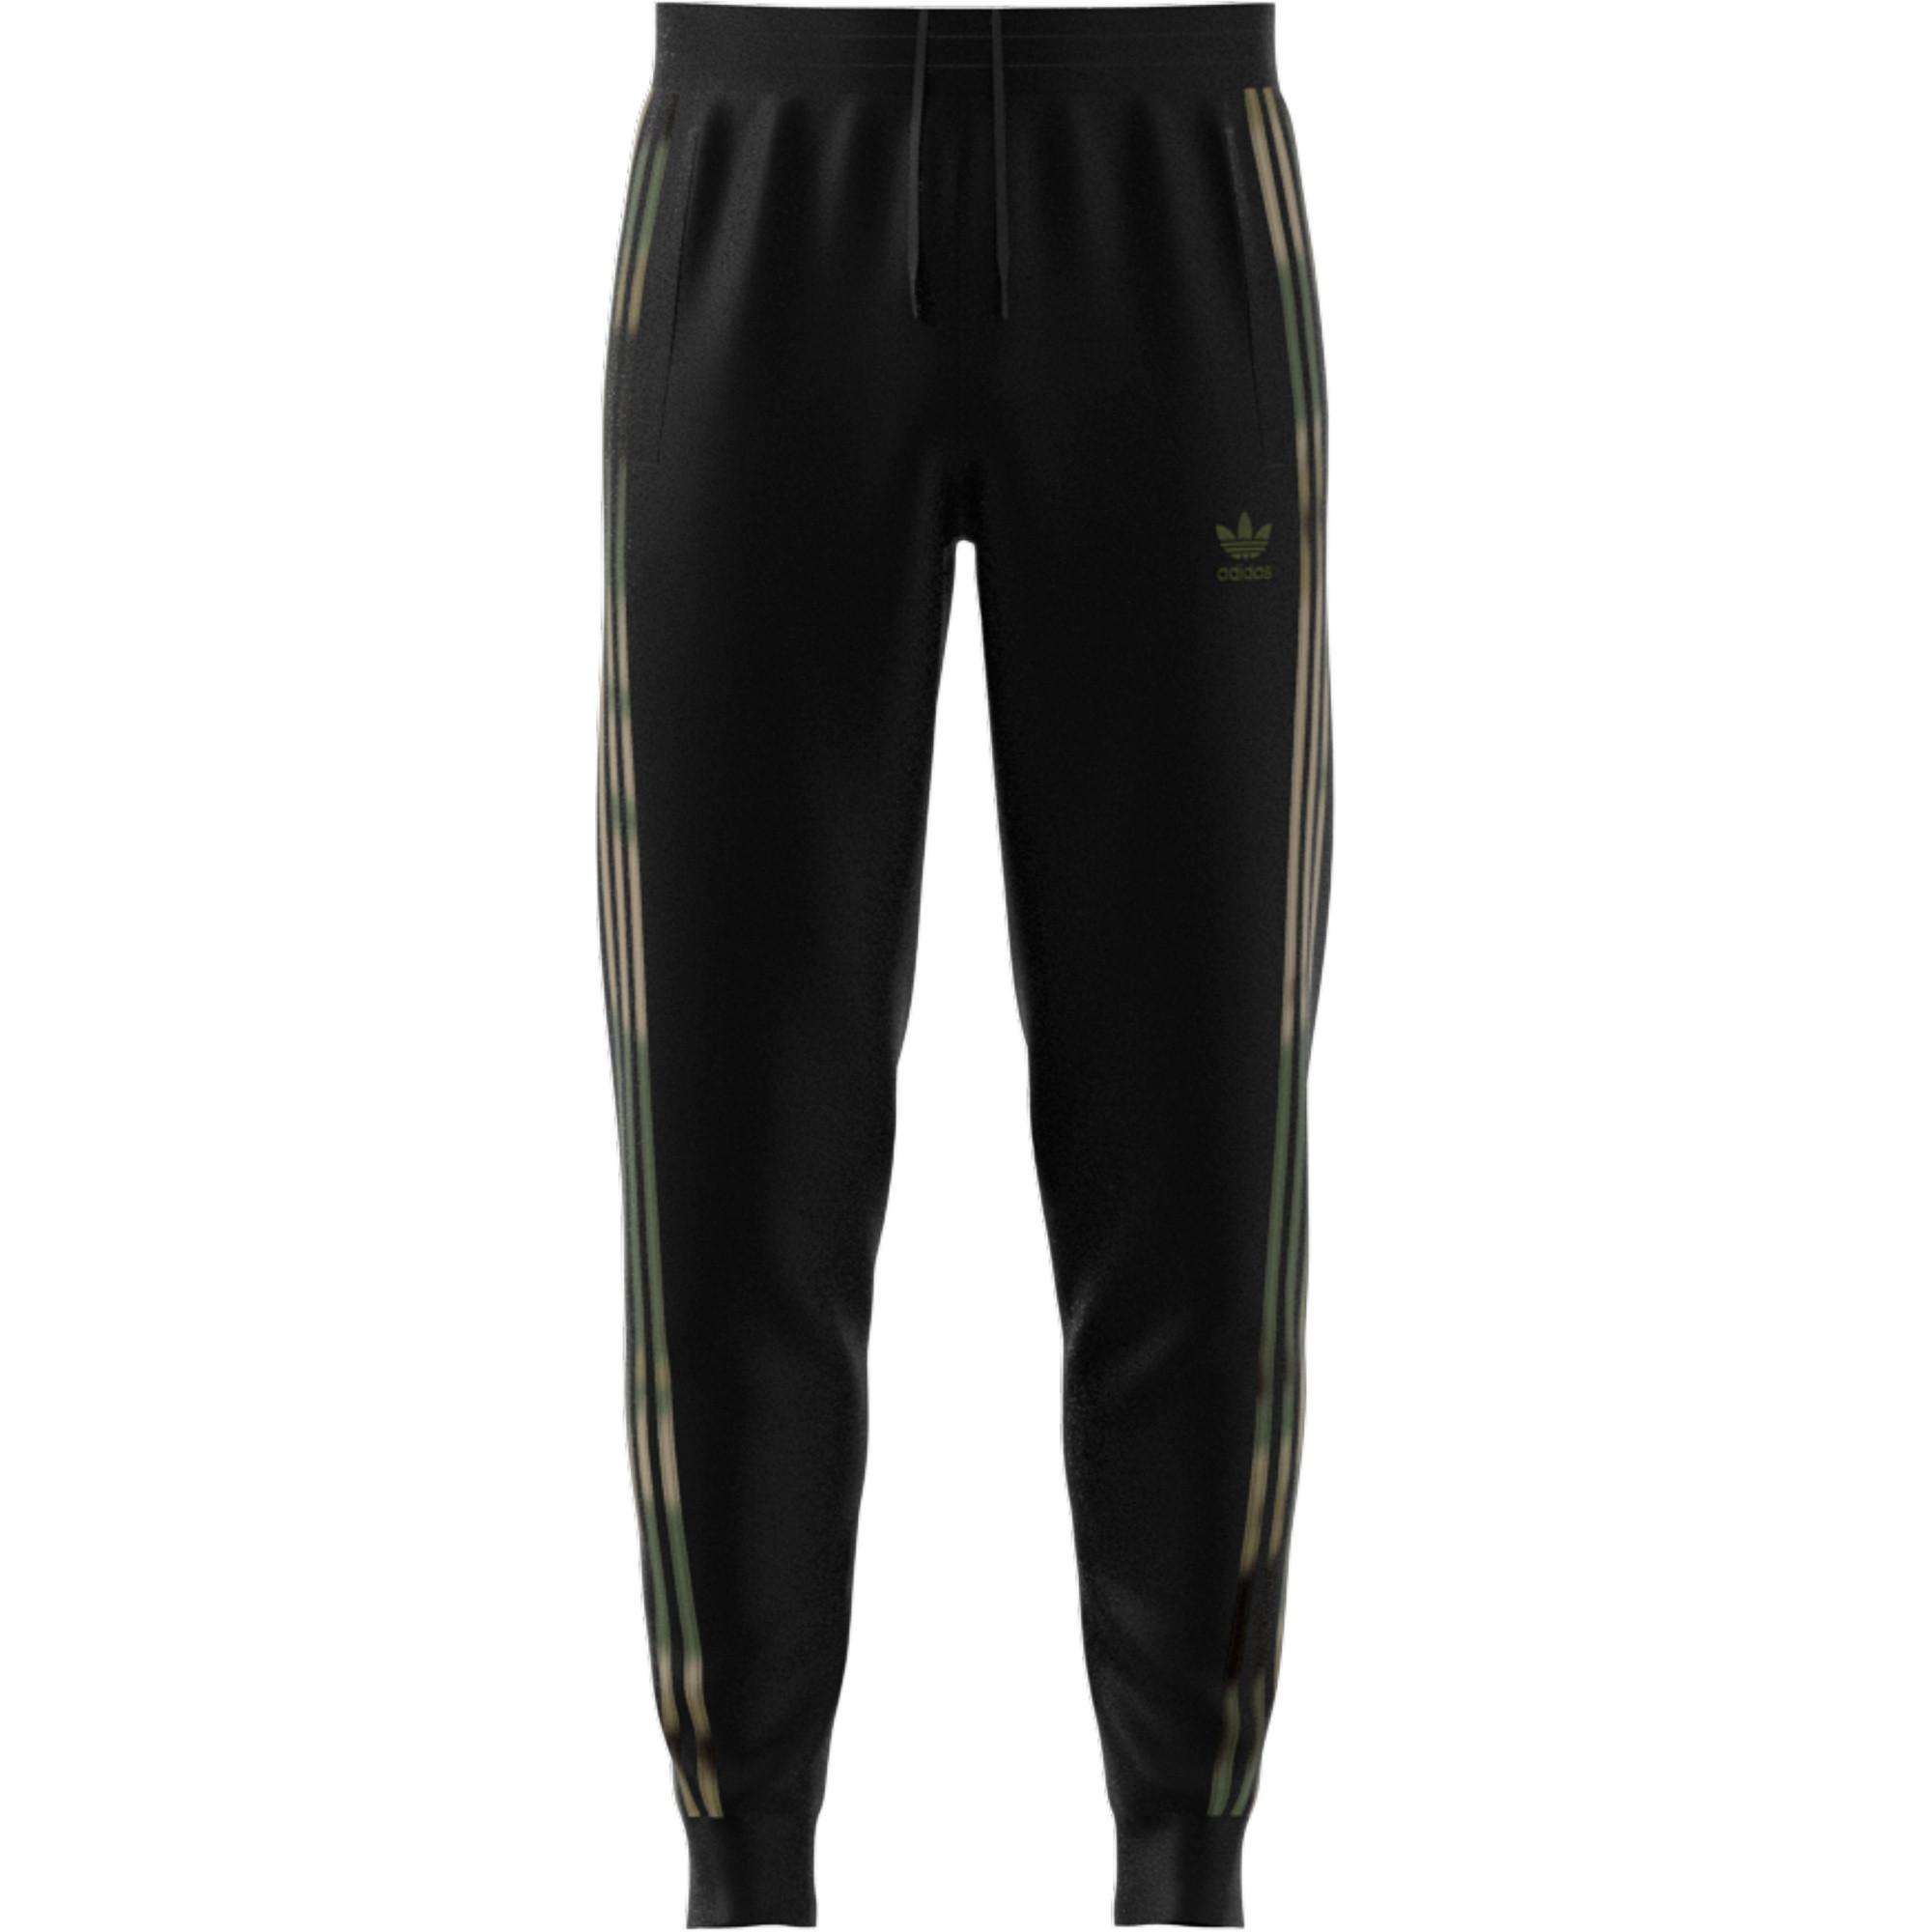 Pantaloni tuta Camo Stripes, Multicolor, large image number 0